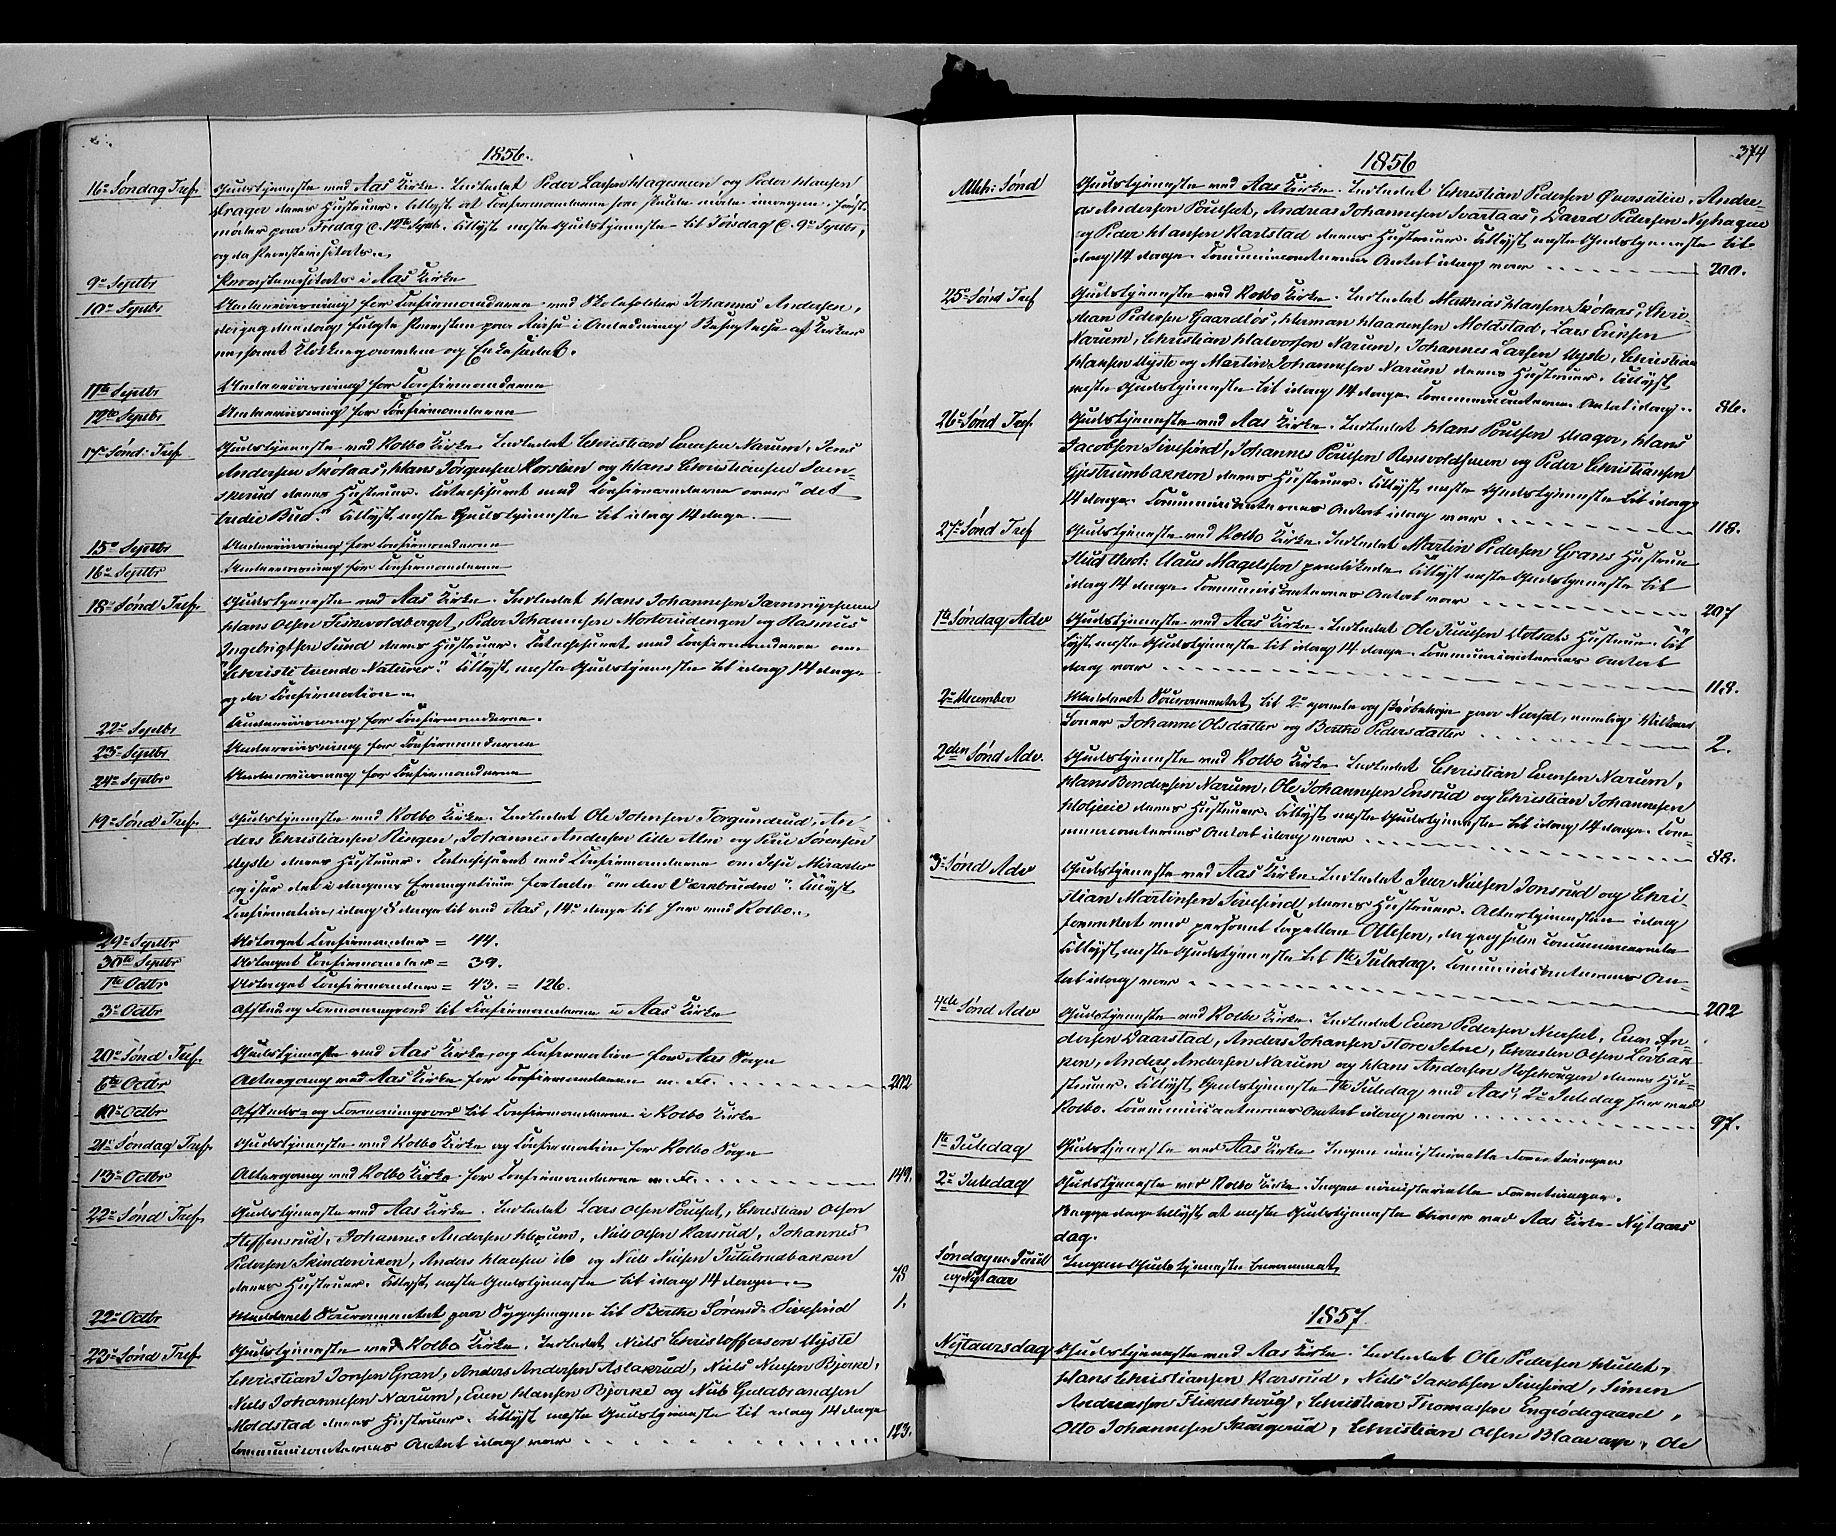 SAH, Vestre Toten prestekontor, H/Ha/Haa/L0006: Ministerialbok nr. 6, 1856-1861, s. 374